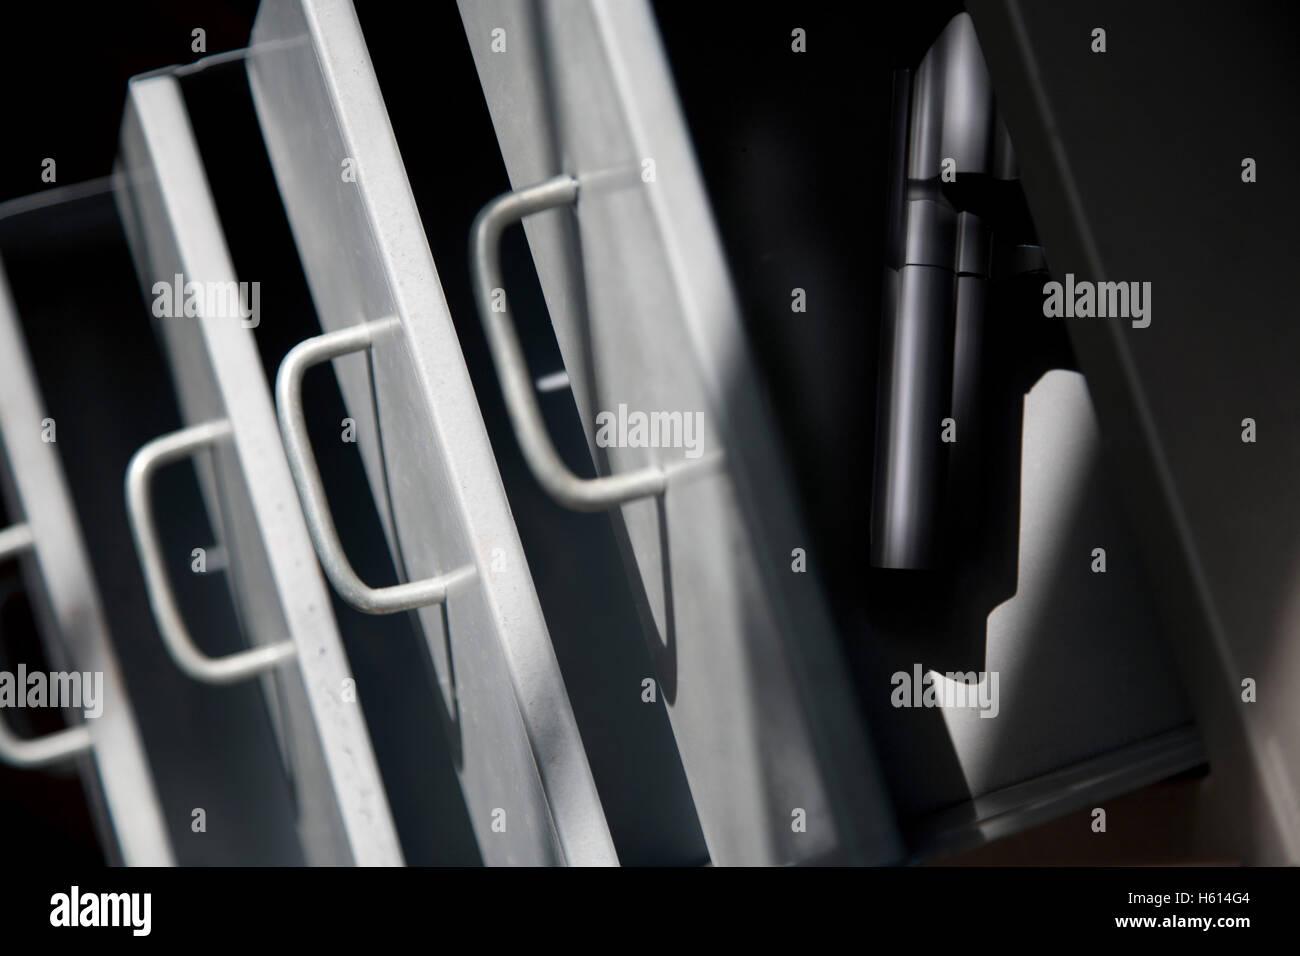 Handgun in Top Drawer - Stock Image